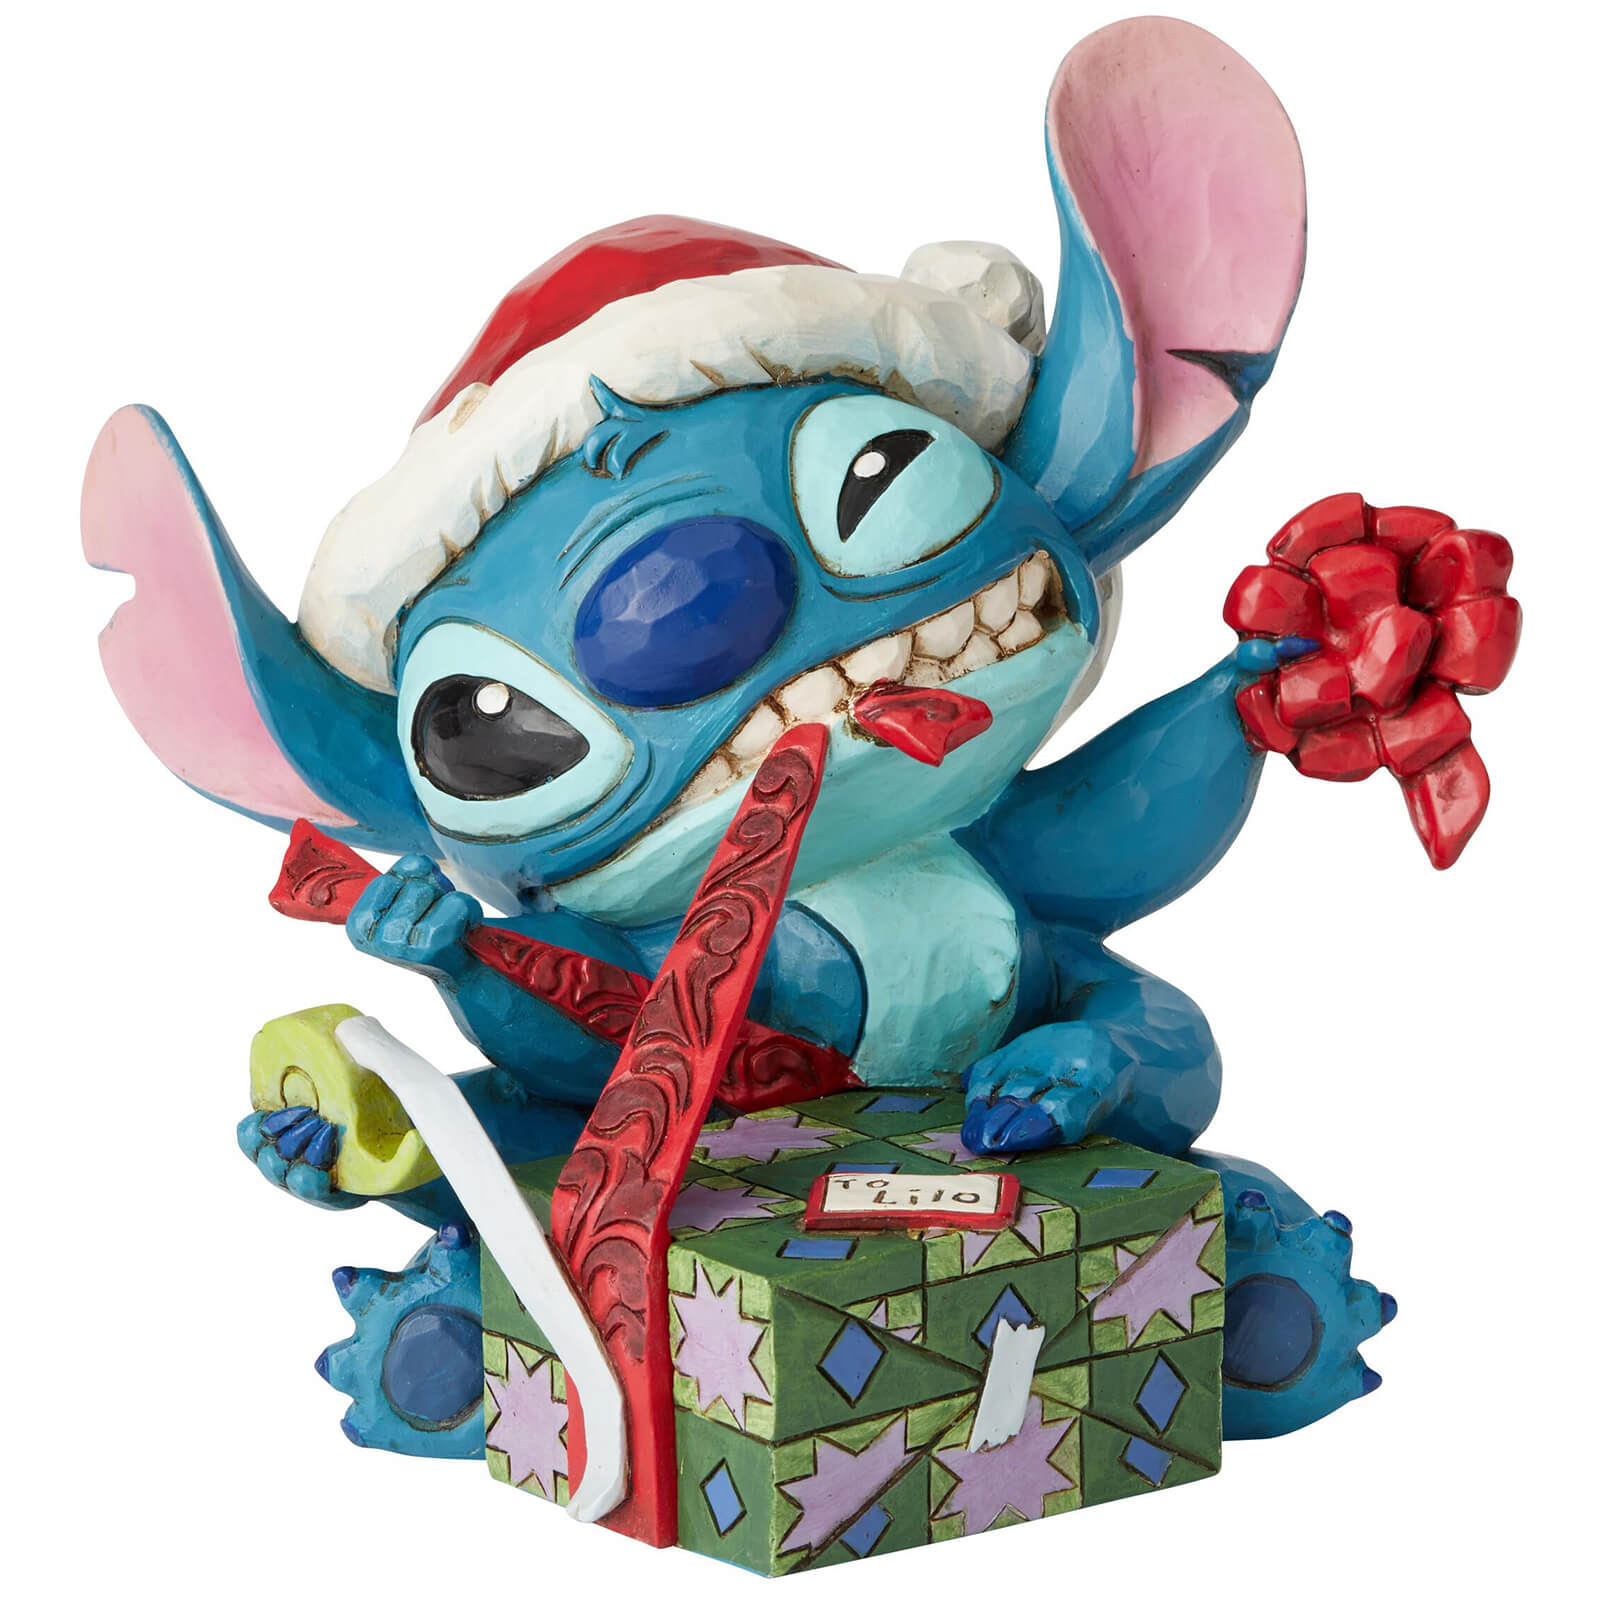 Image of Disney Traditions Bad Wrap (Stitch with Santa Hat Figurine) 13.0cm